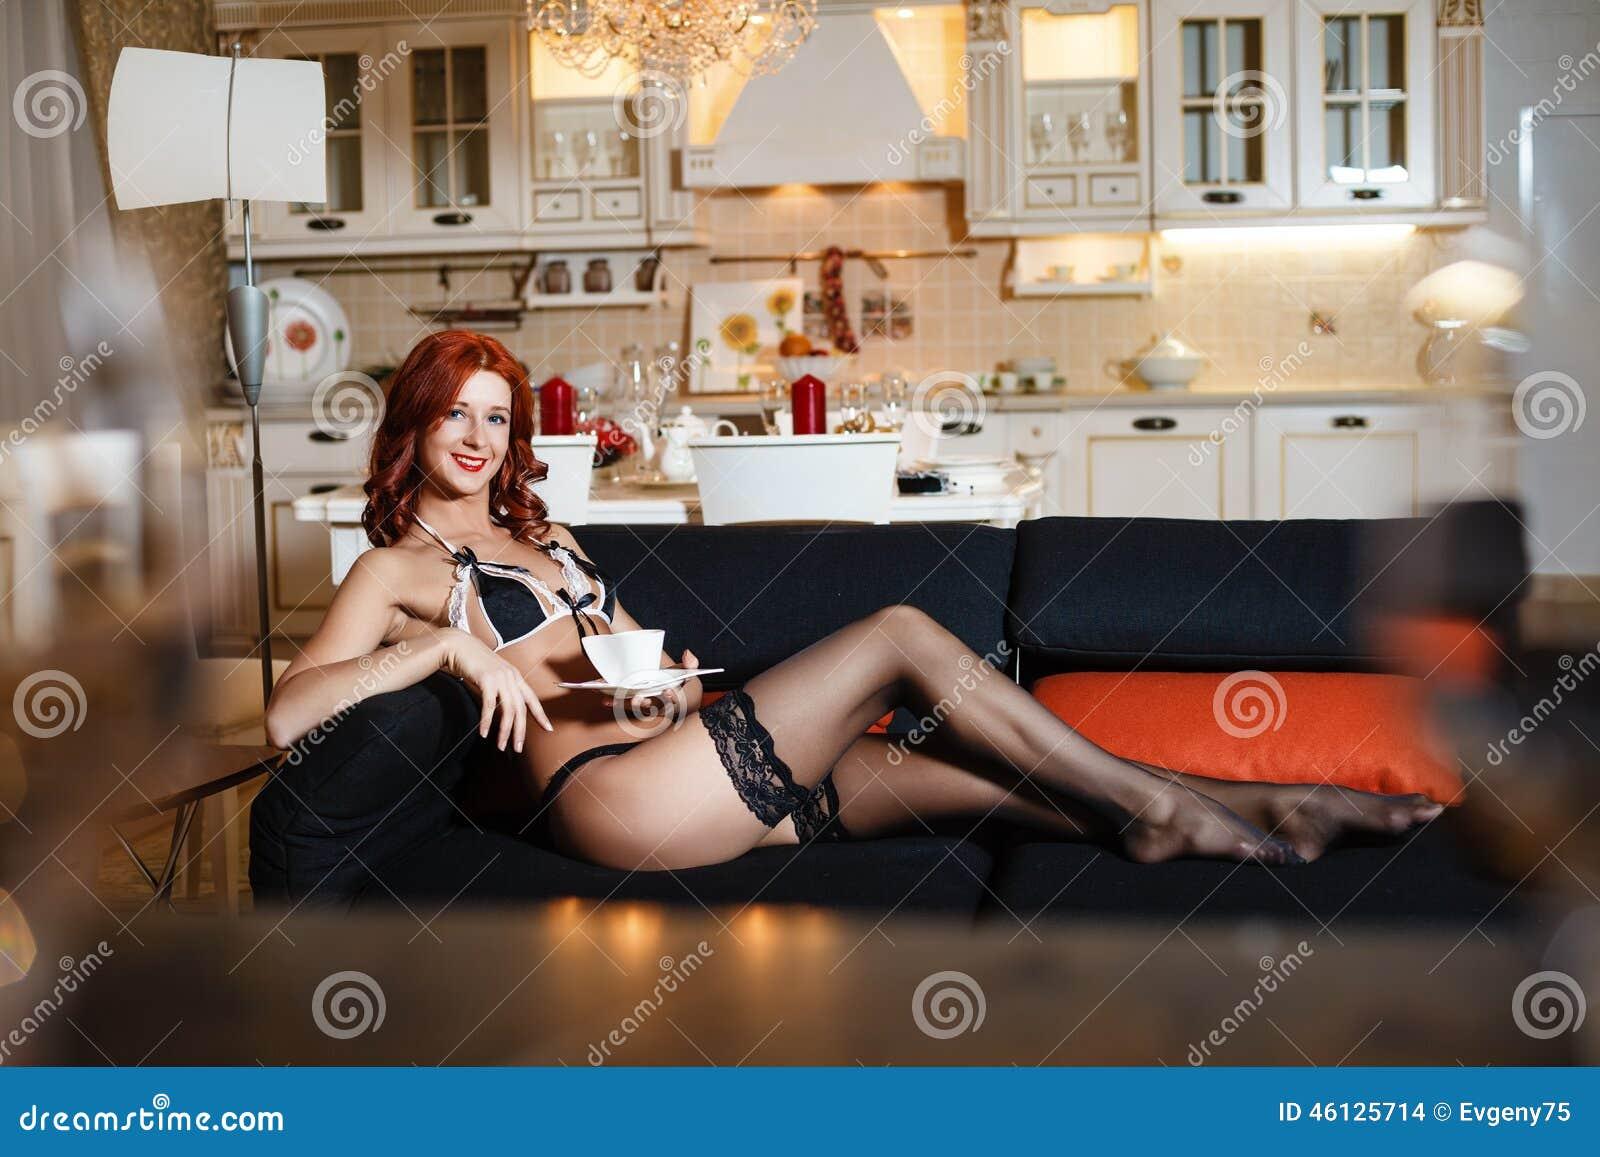 Women wearing latex panties